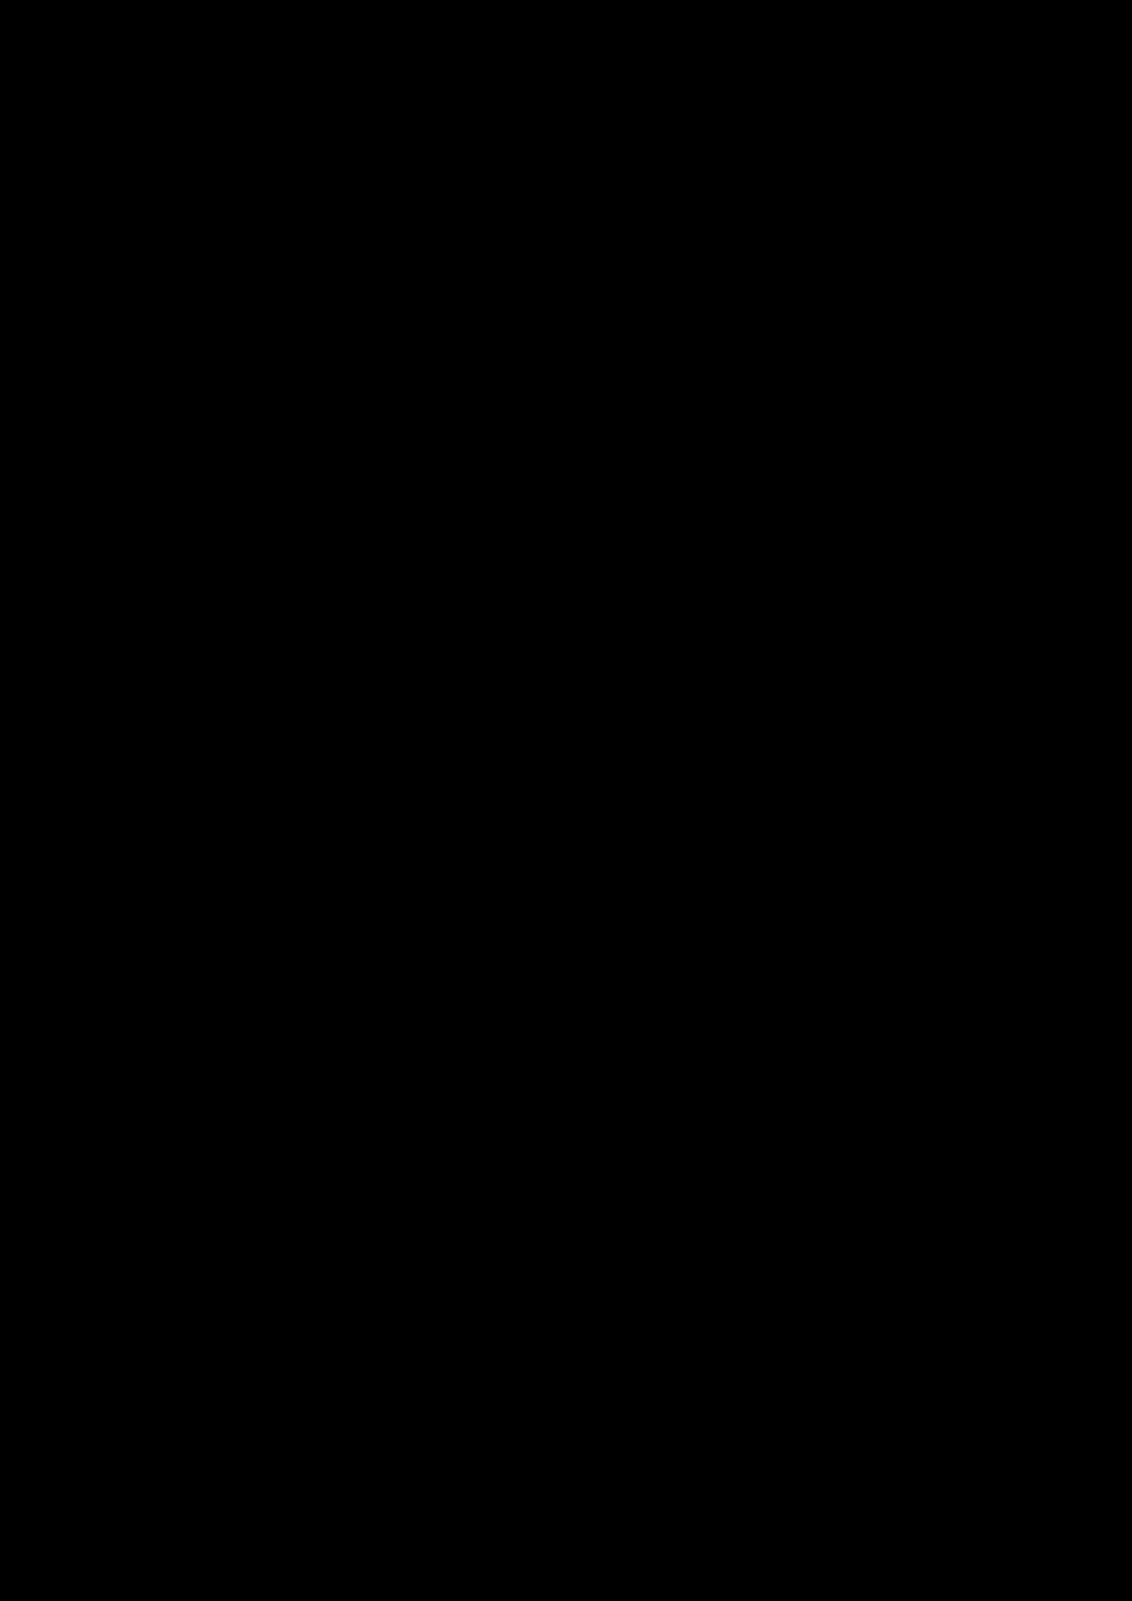 Okean Pustotyi slide, Image 23